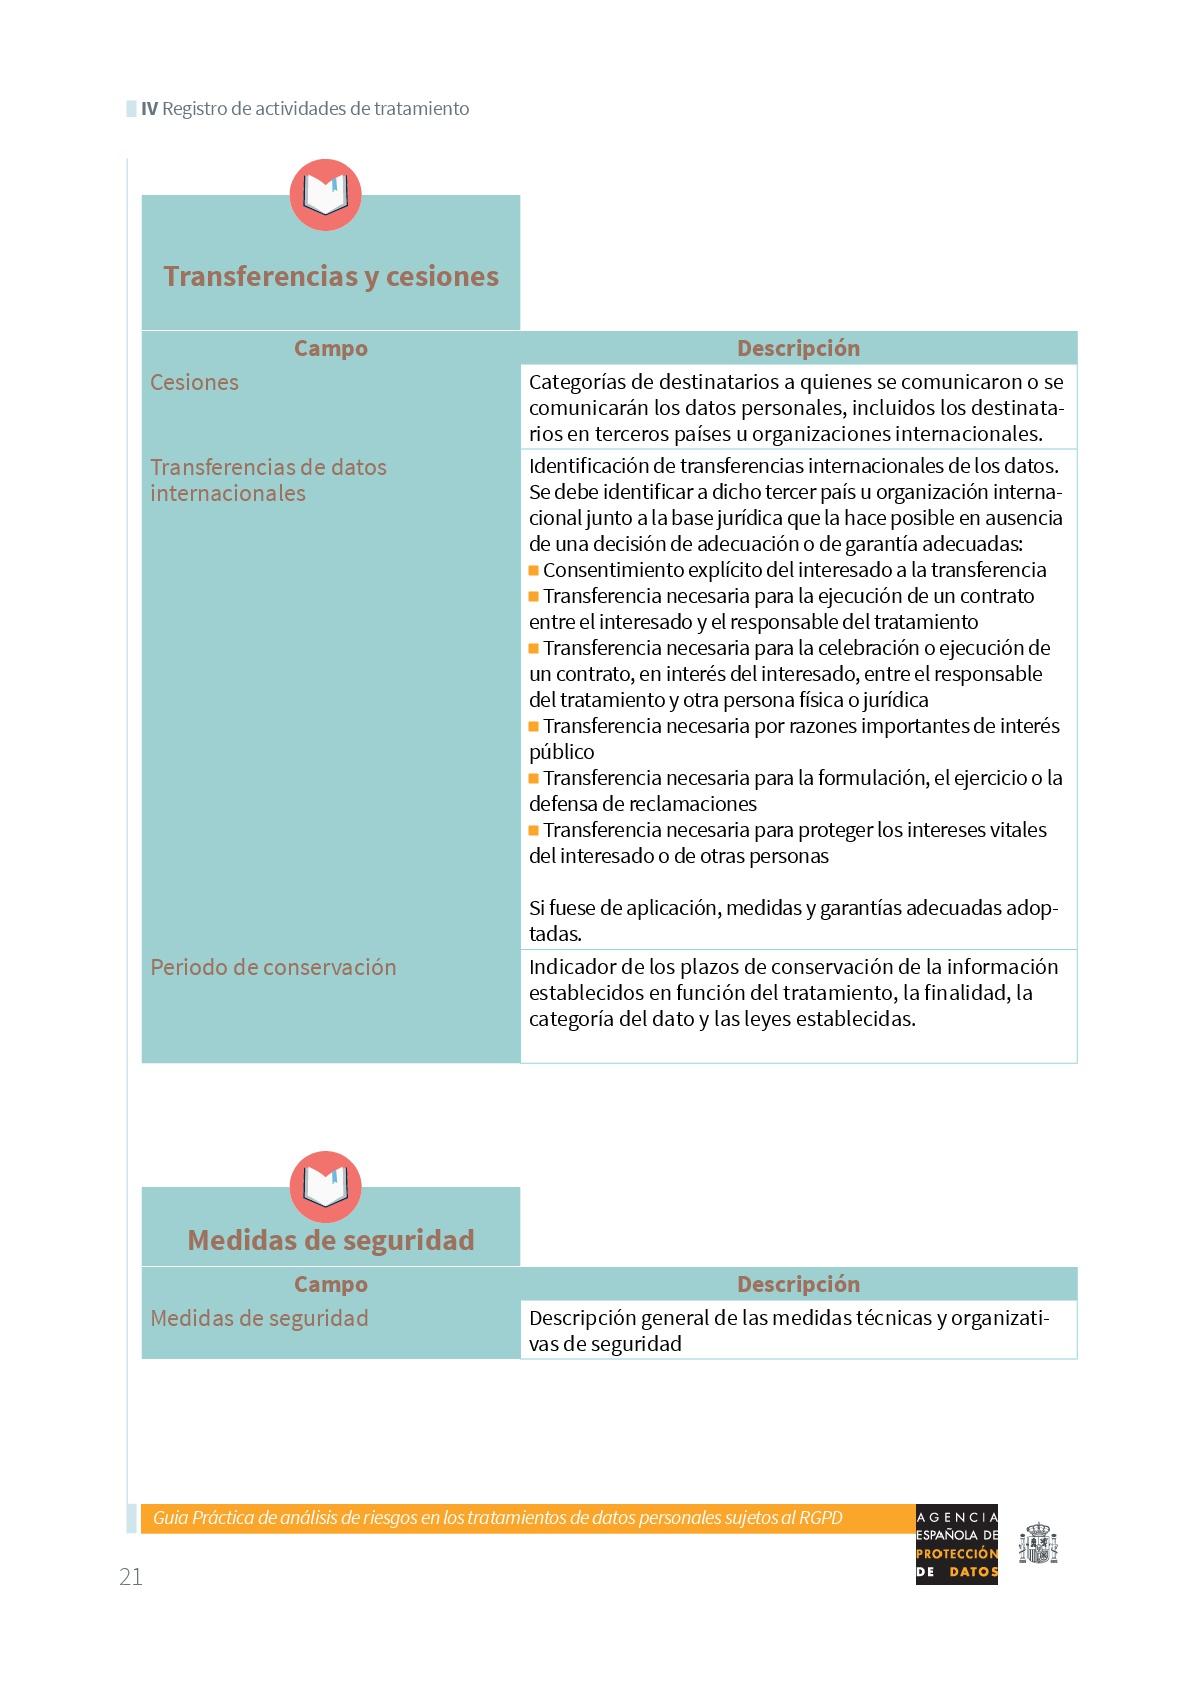 AnalisisDeRiesgosRGPD-022